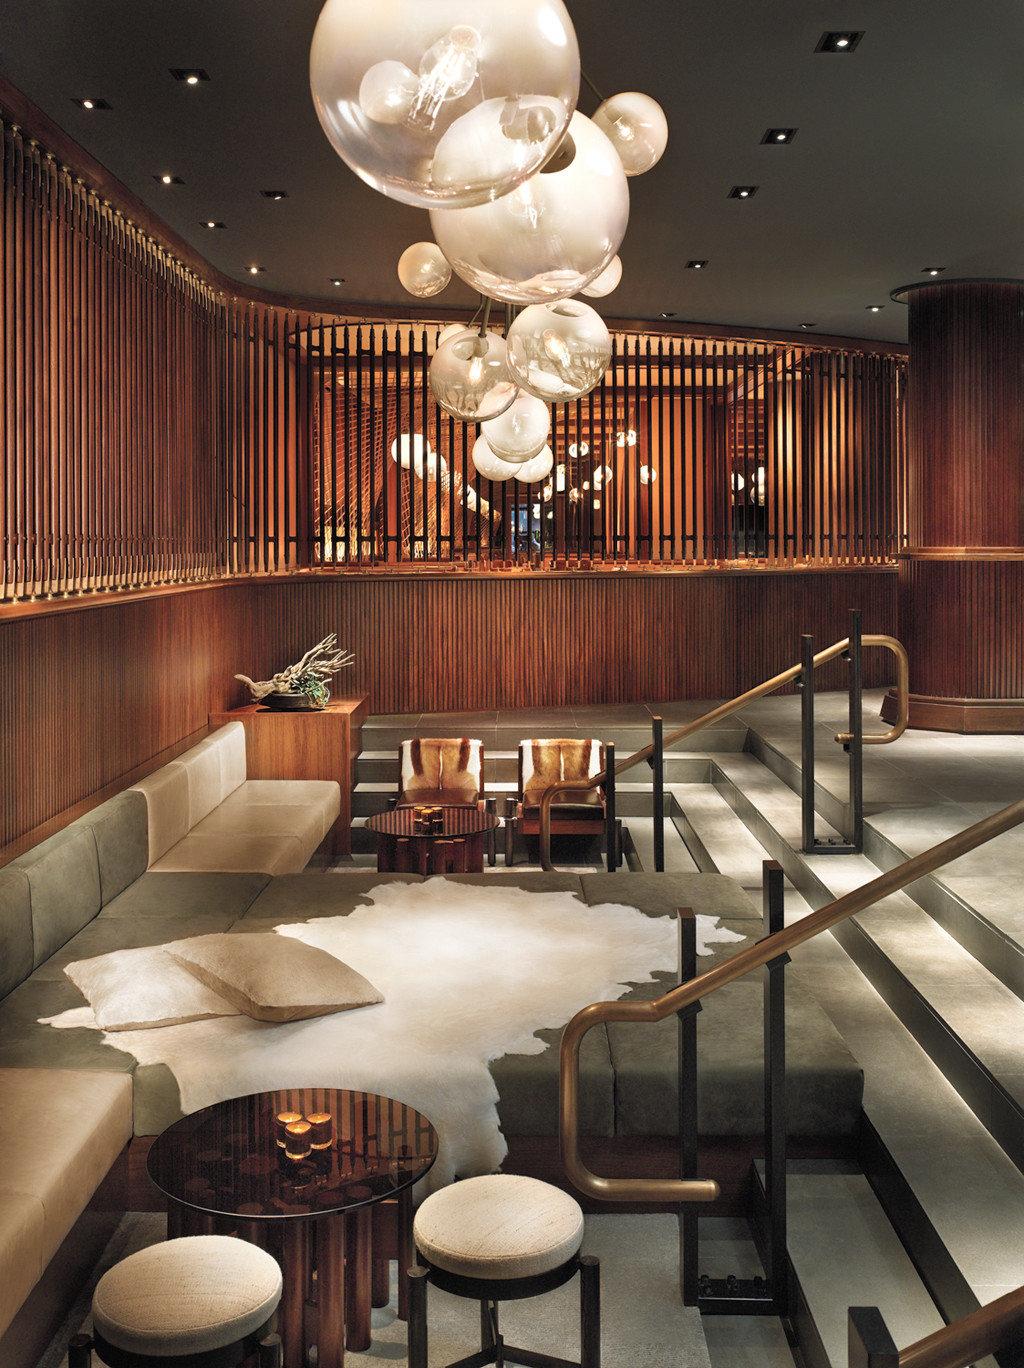 Boutique City Hotels Lobby Lounge Luxury Trip Ideas restaurant lighting Bar living room